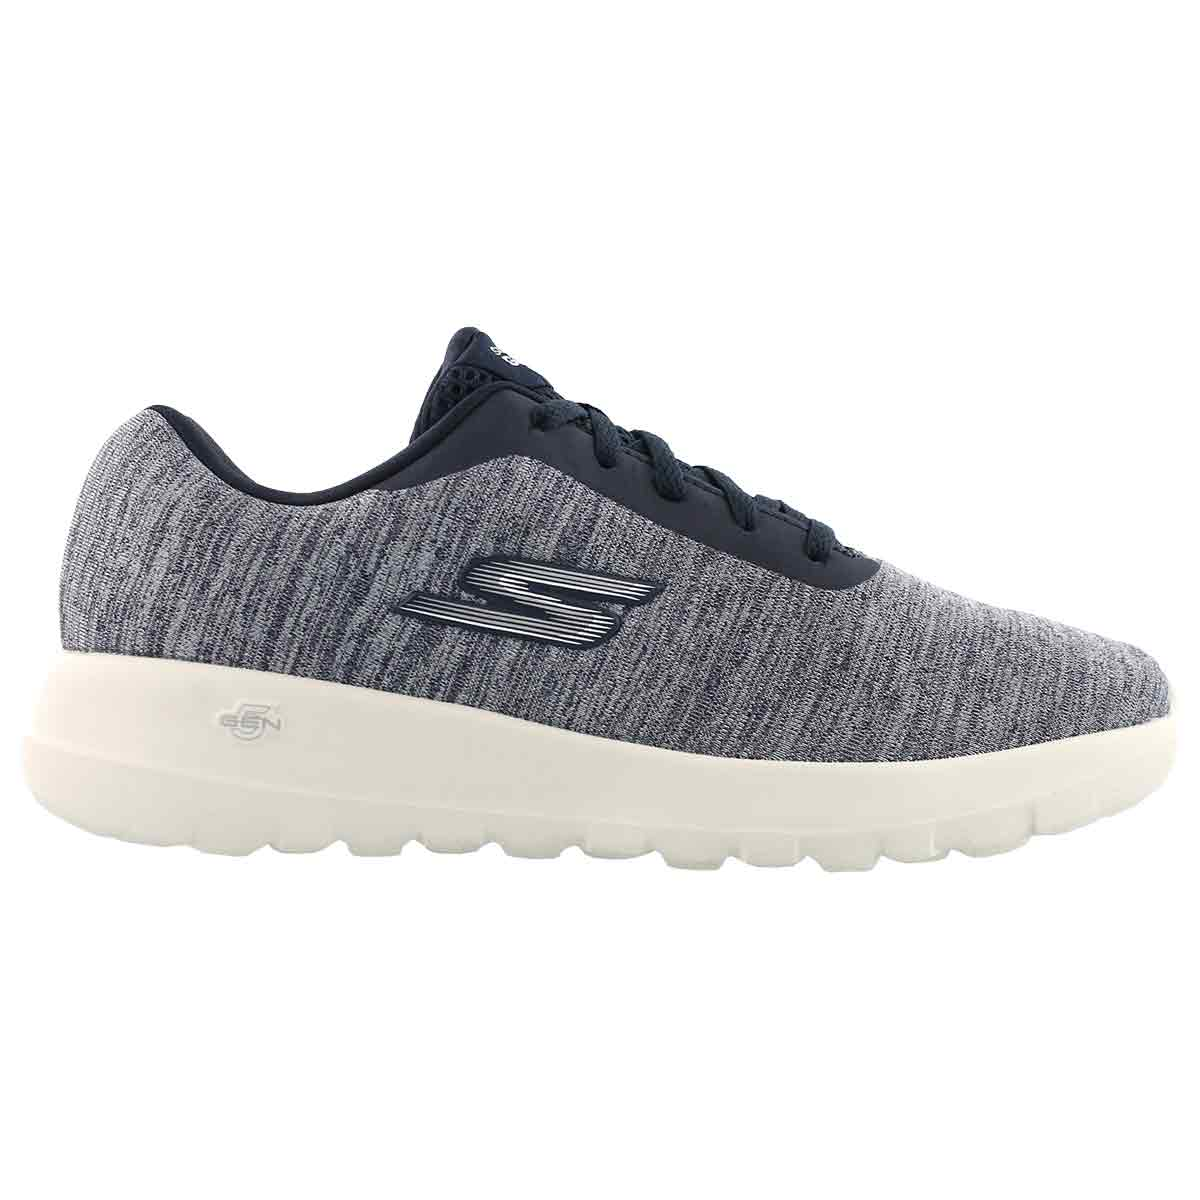 Lds GOwalk Joy Hero navy lace up shoe